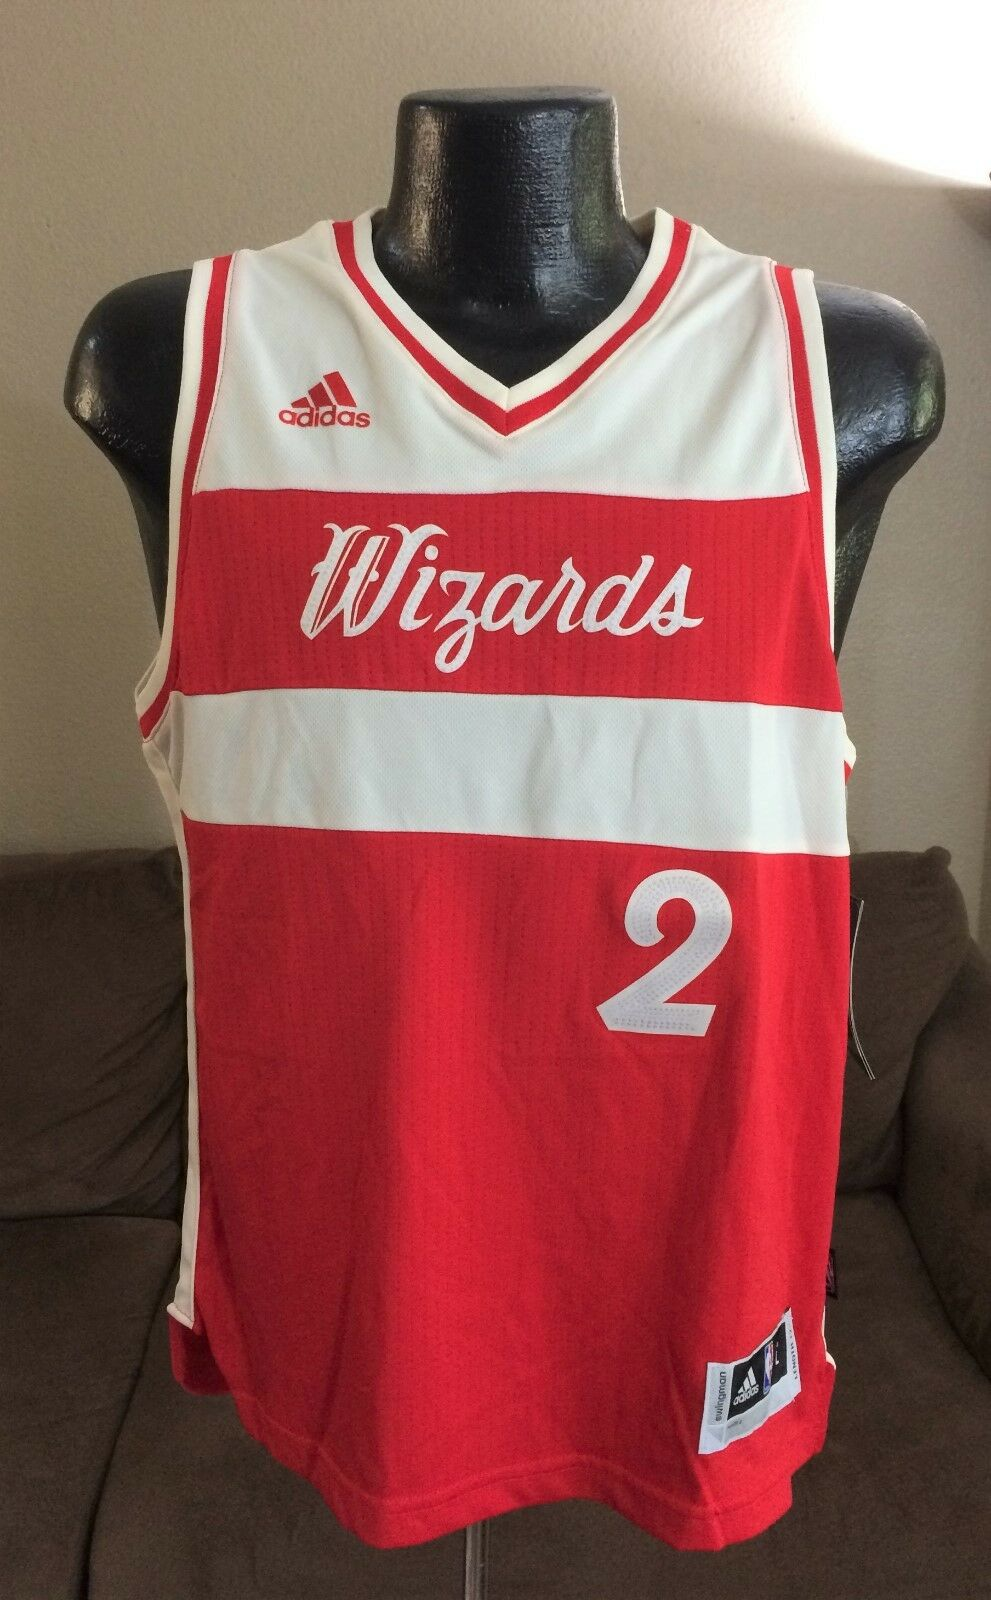 NBA WASHINGTON WIZARDS John Wall No. 2 Adidas Swingman Chris